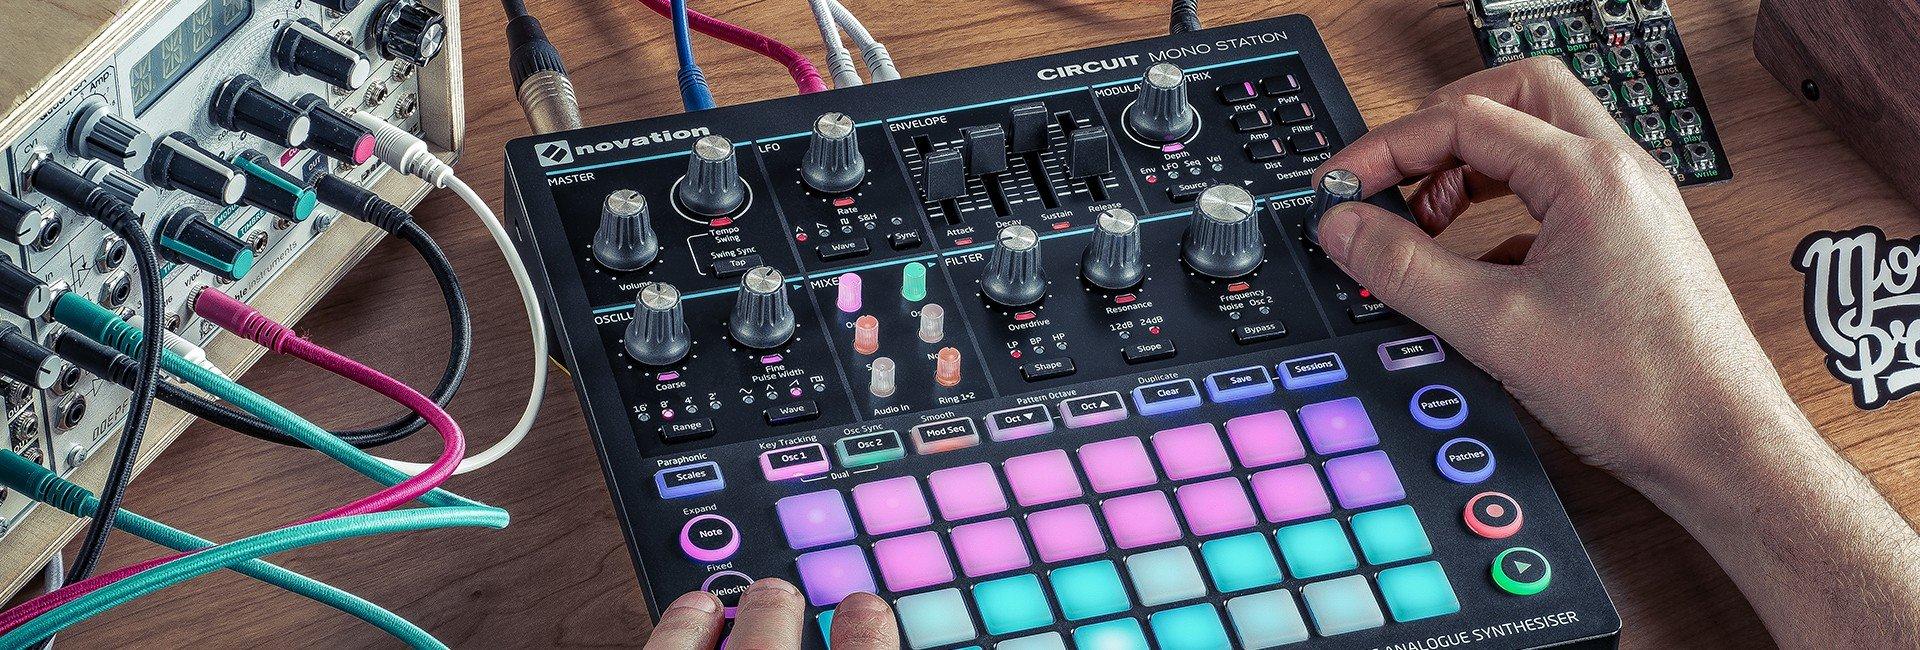 Novation Circuit Mono Station Paraphonic Analog Synthesizer with Ableton Live Lite, DJ Gig Bag and Headphones